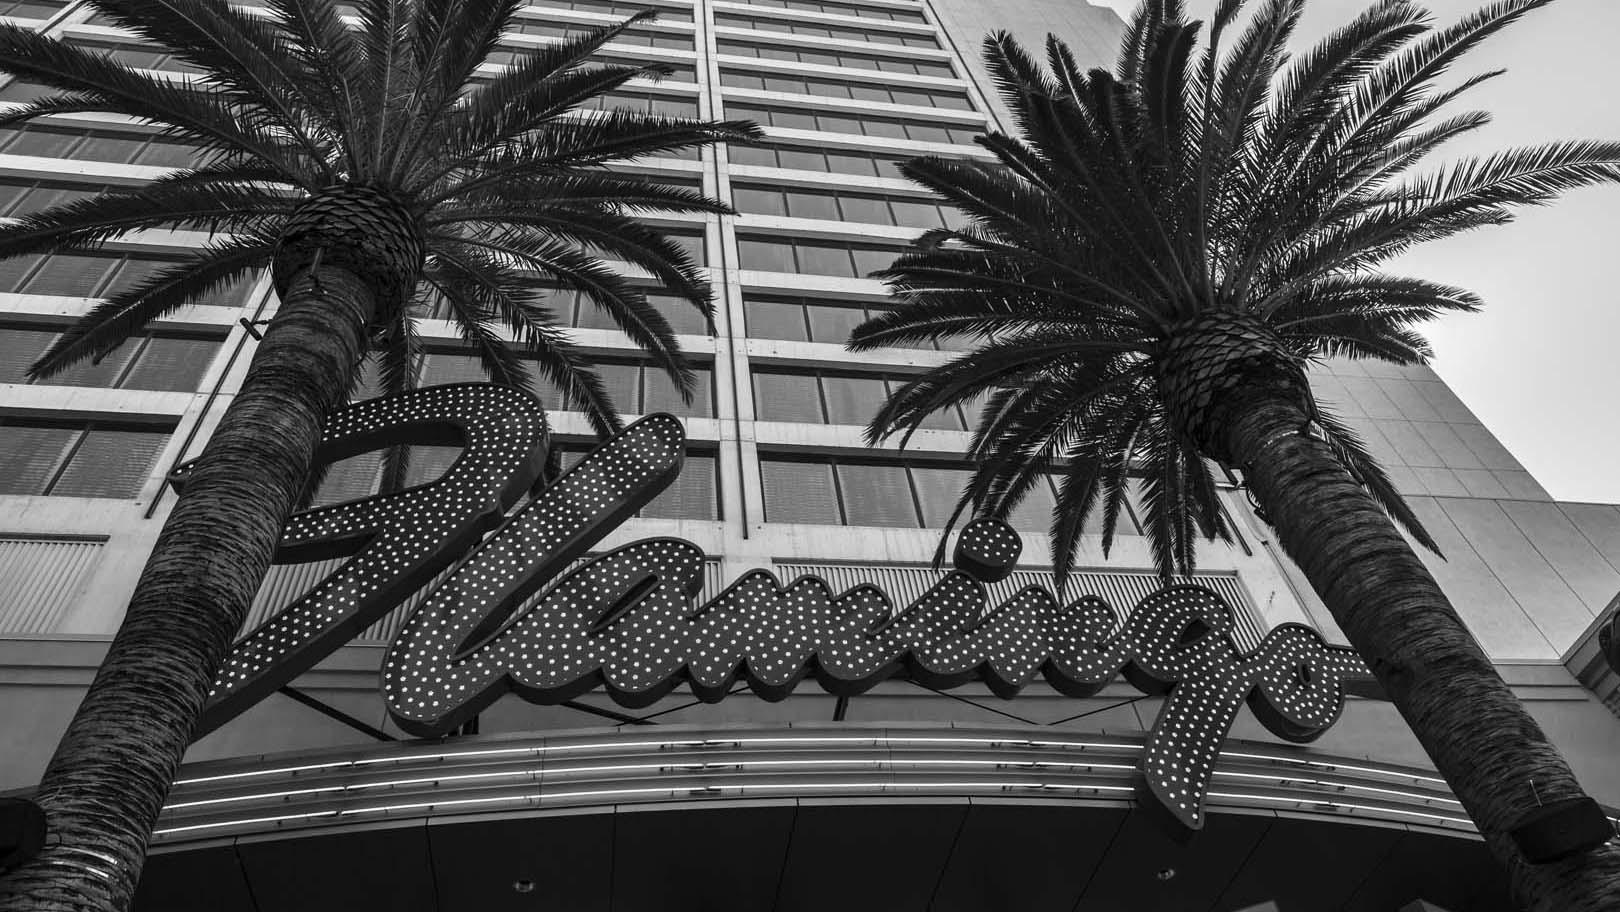 flamingo_hotel.jpg